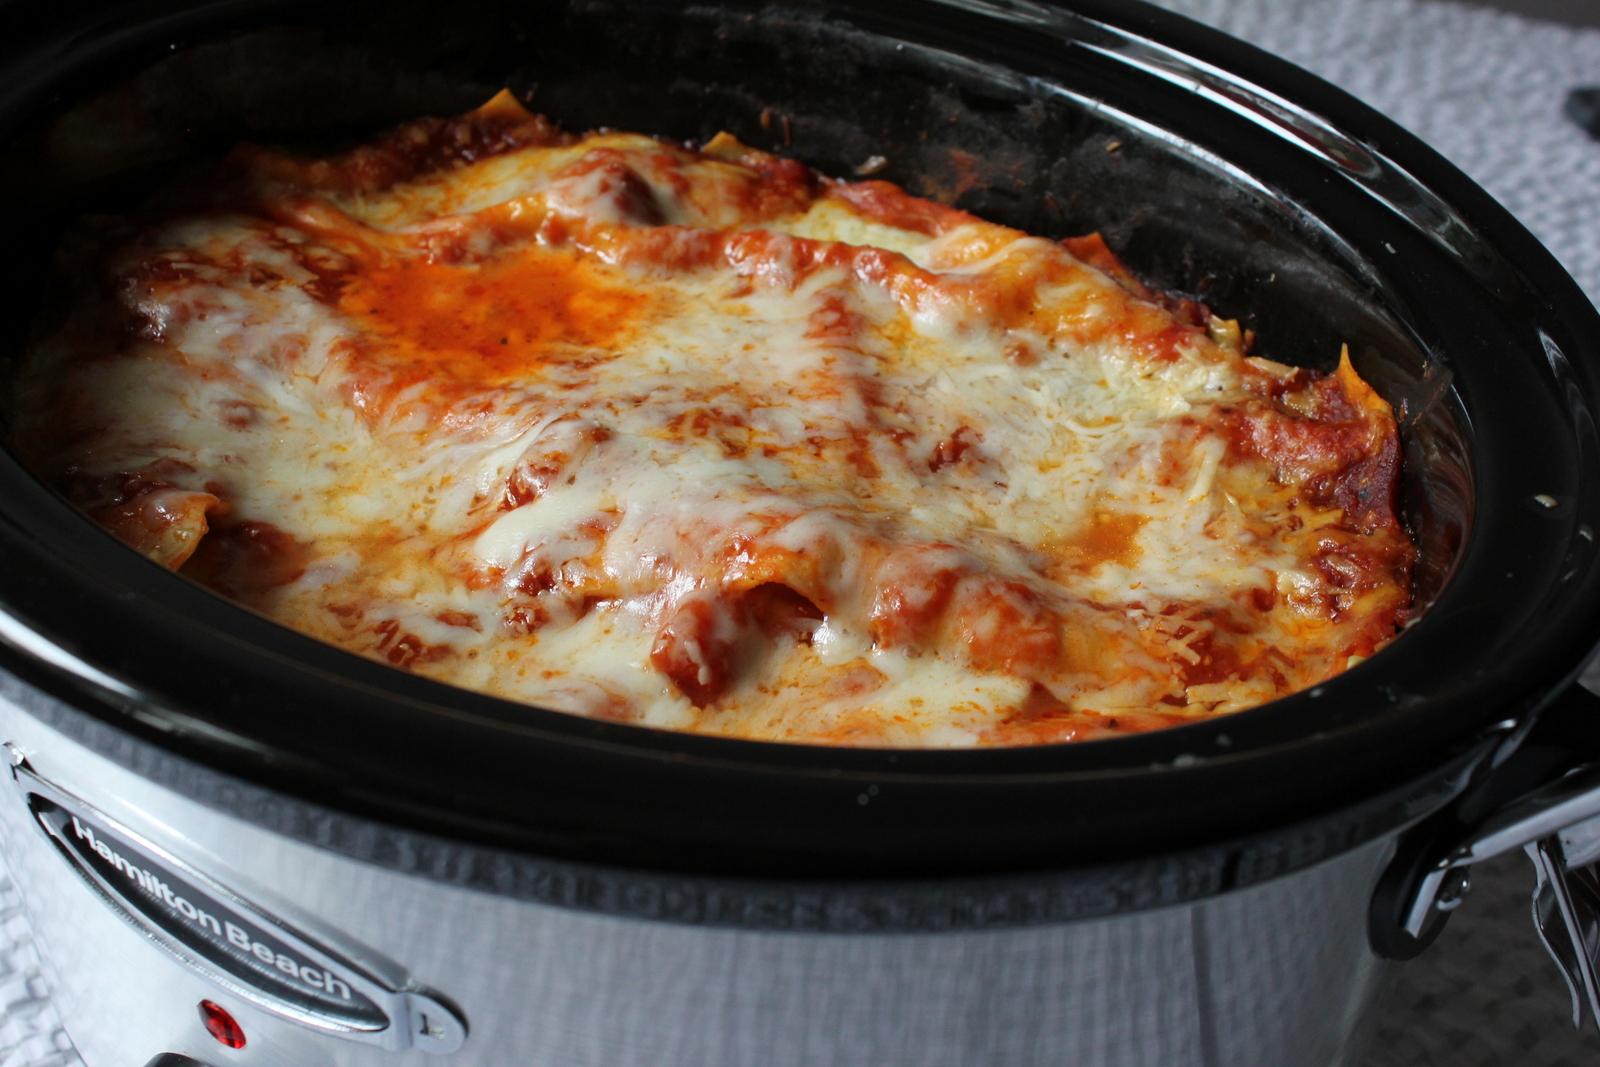 Delightful Slow Cooker / Crockpot Lasagna